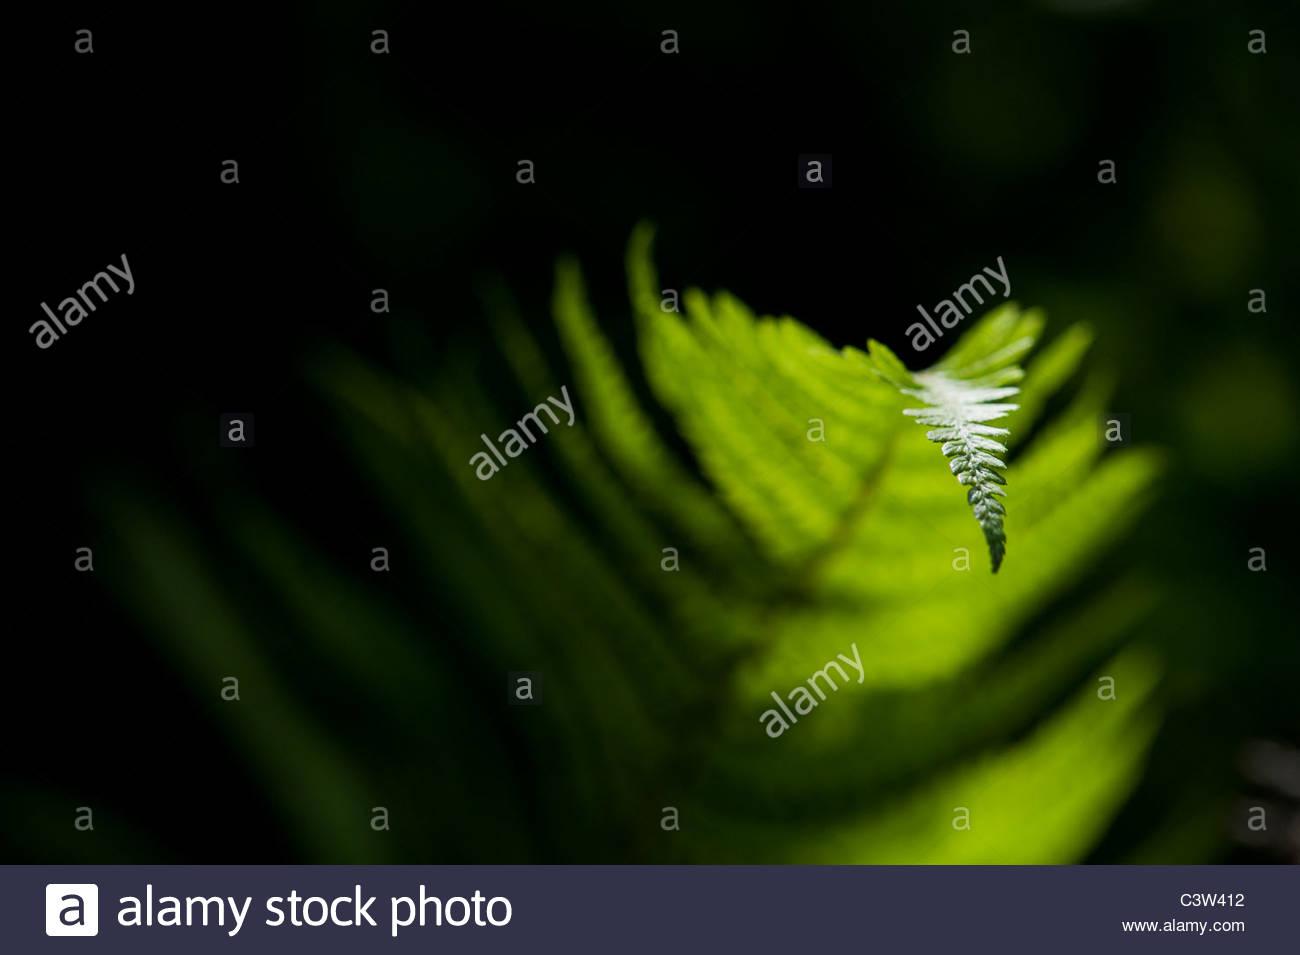 Pteridium aquilinum. Bracken fern lit up by sunlight against a dark background - Stock Image